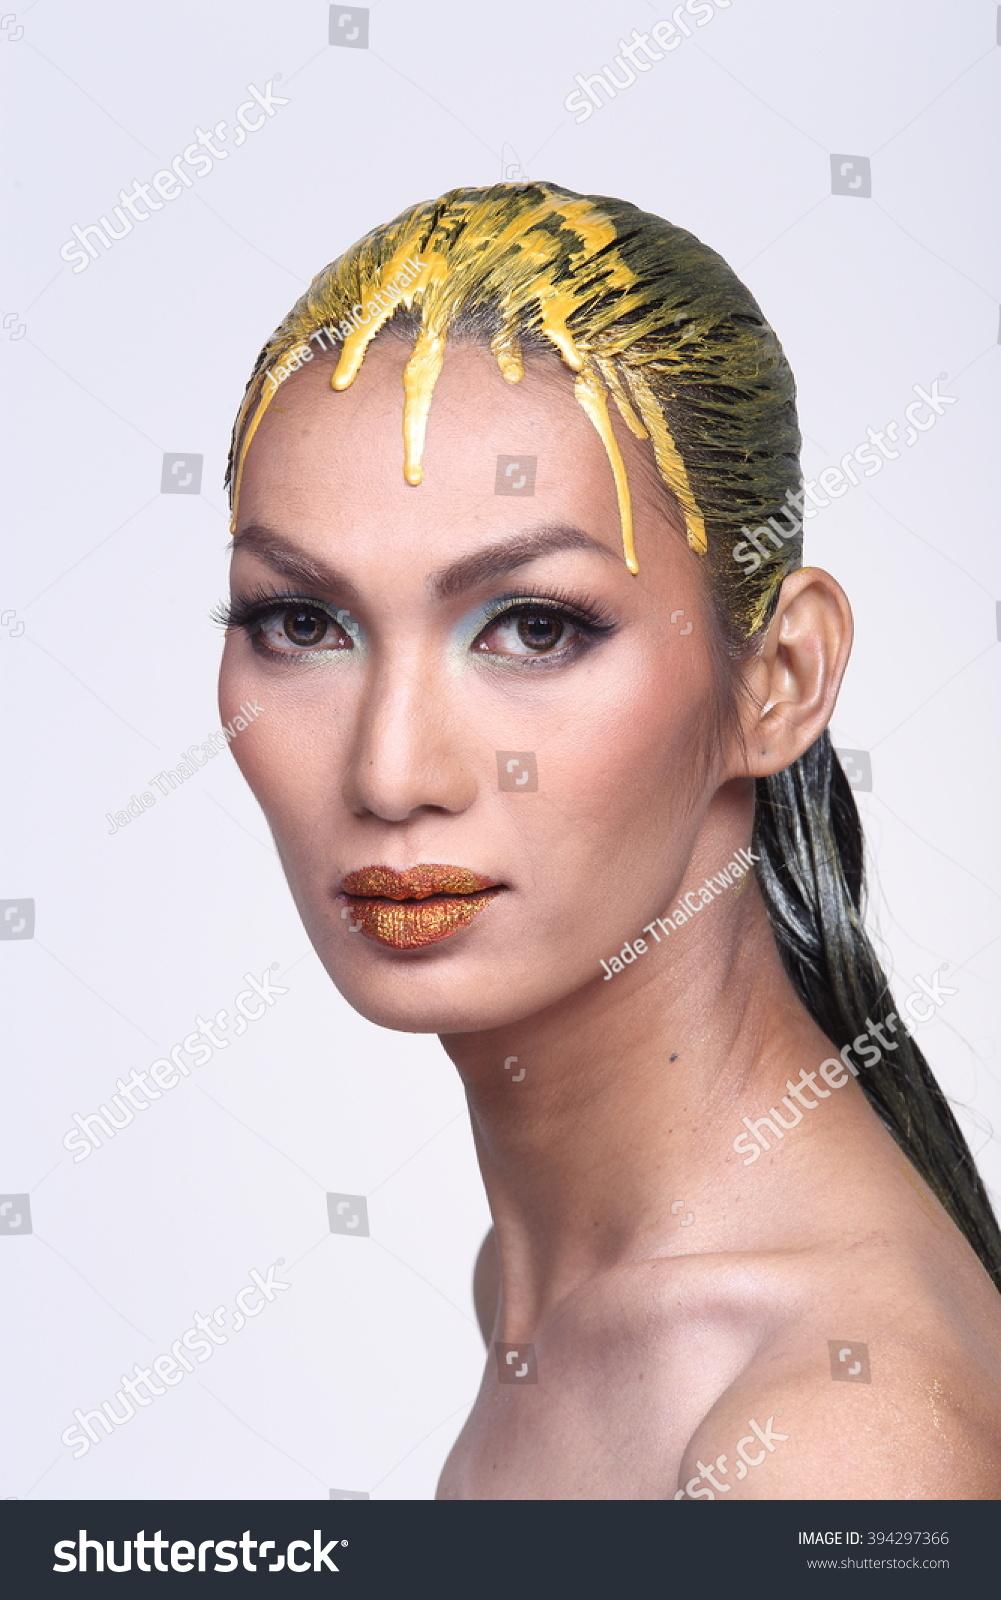 Голден транс косметика